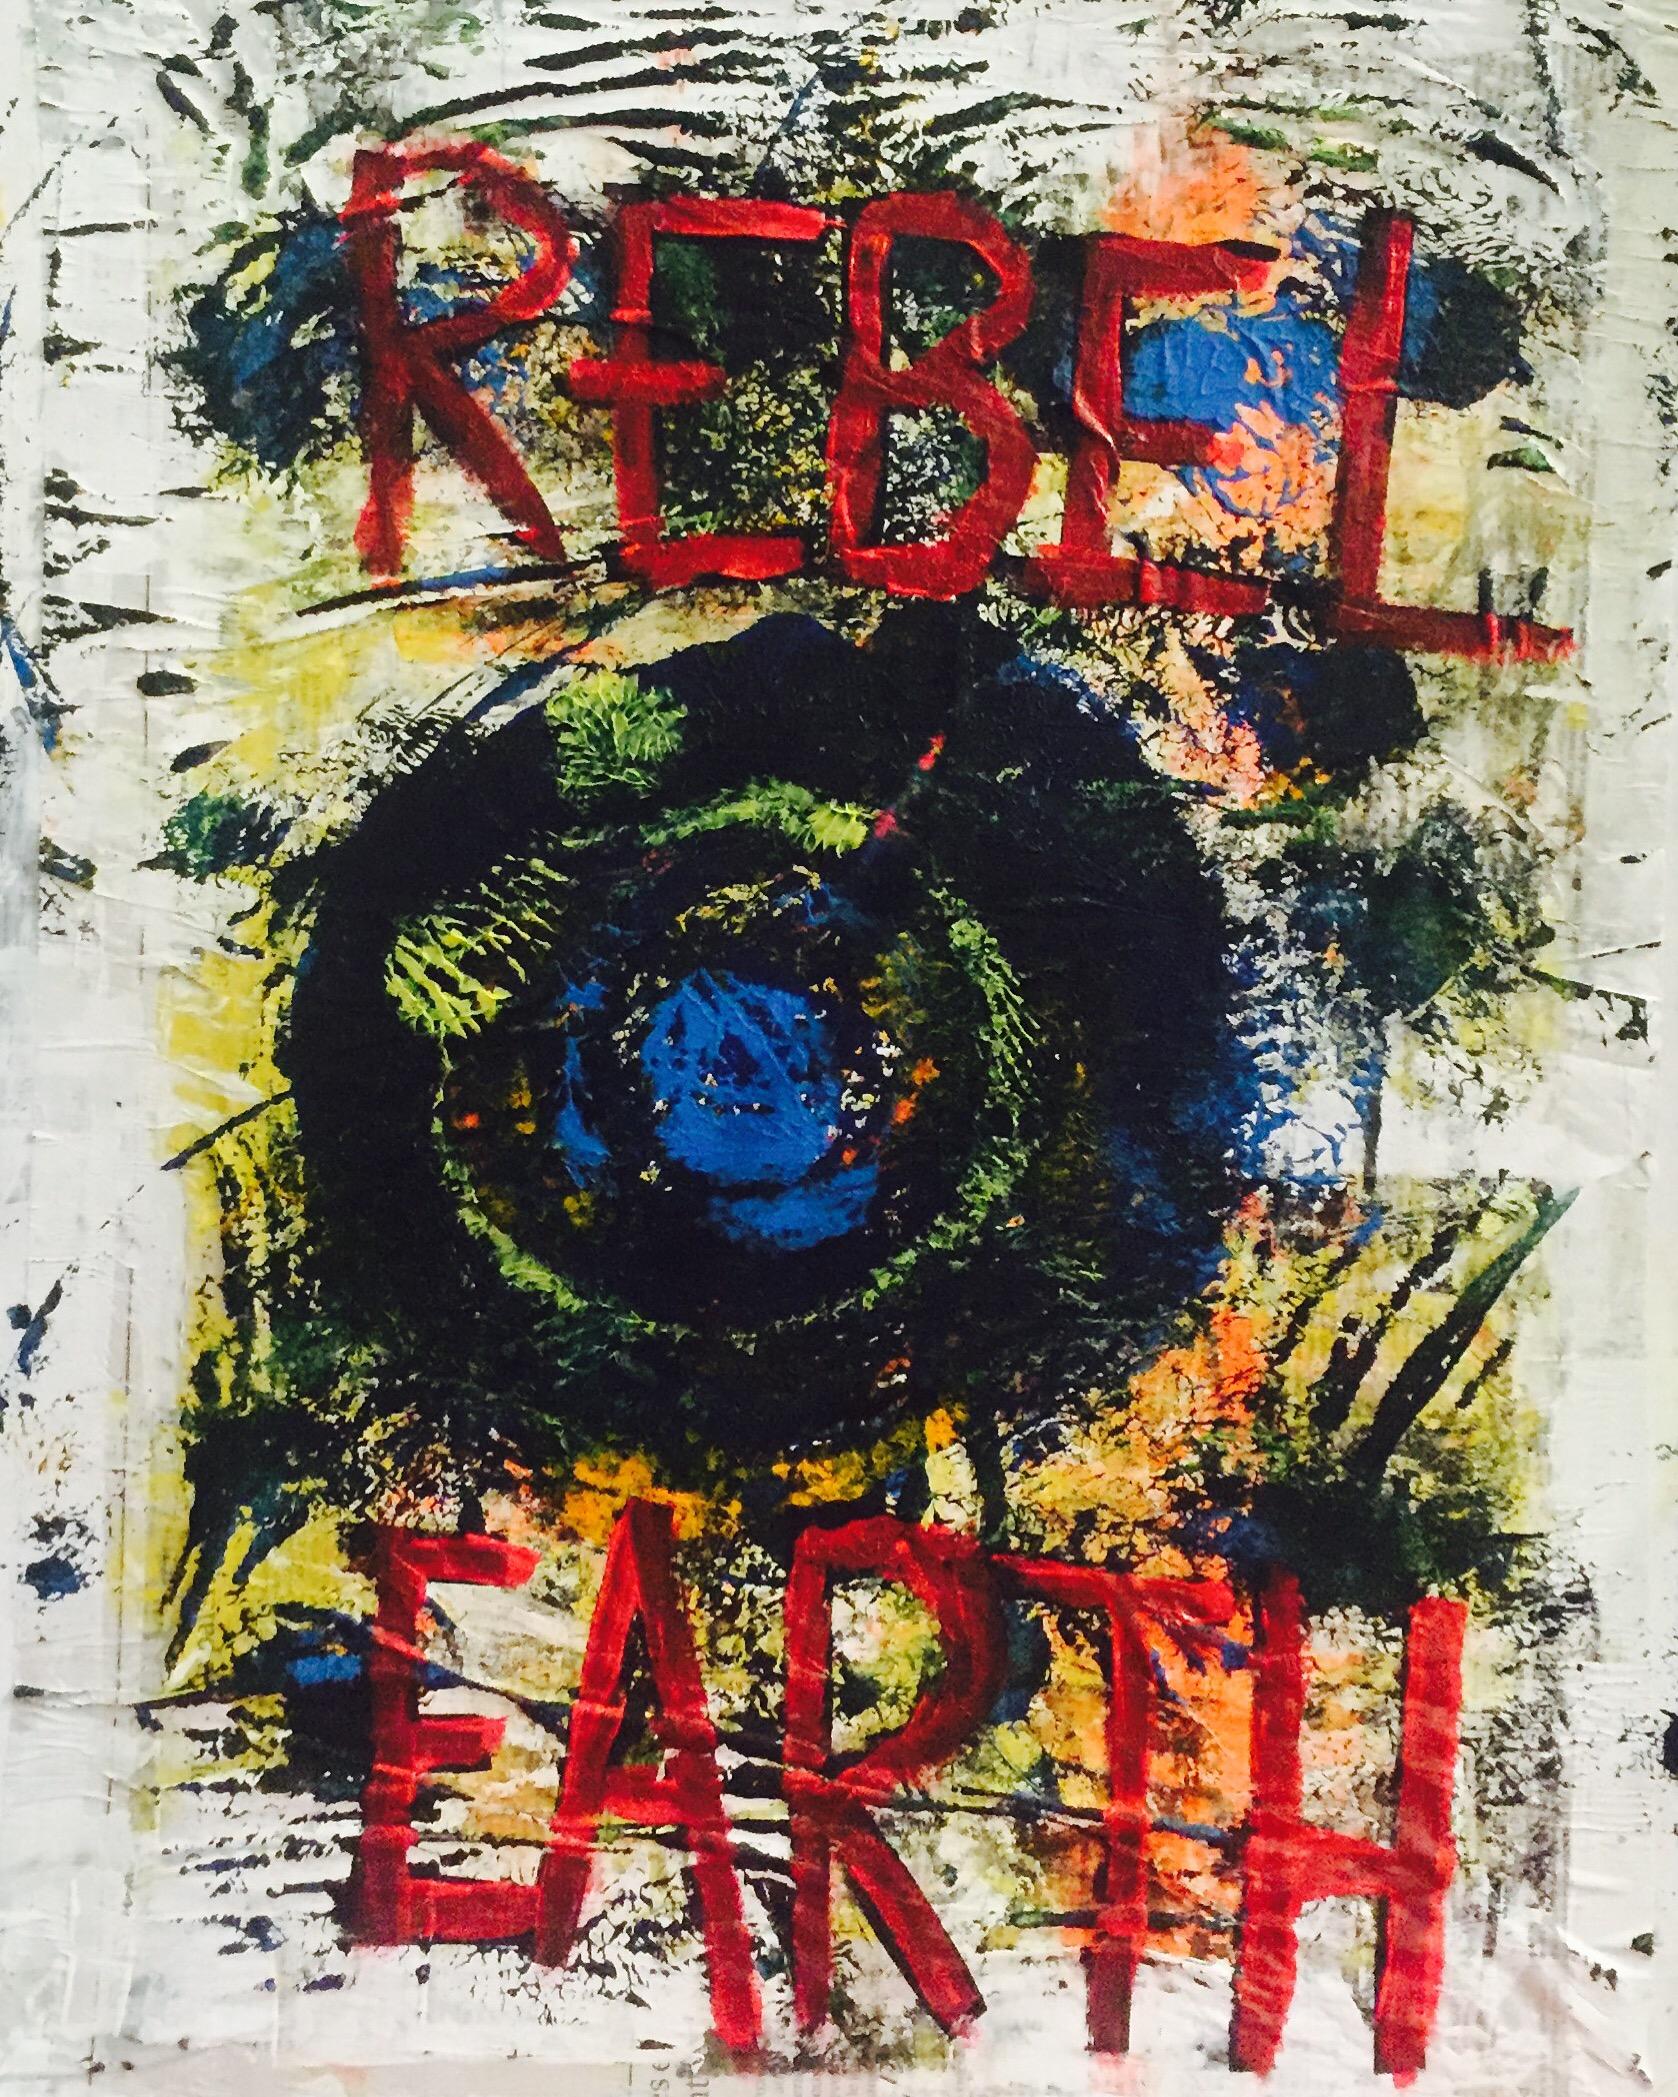 Rebel earth 2/3